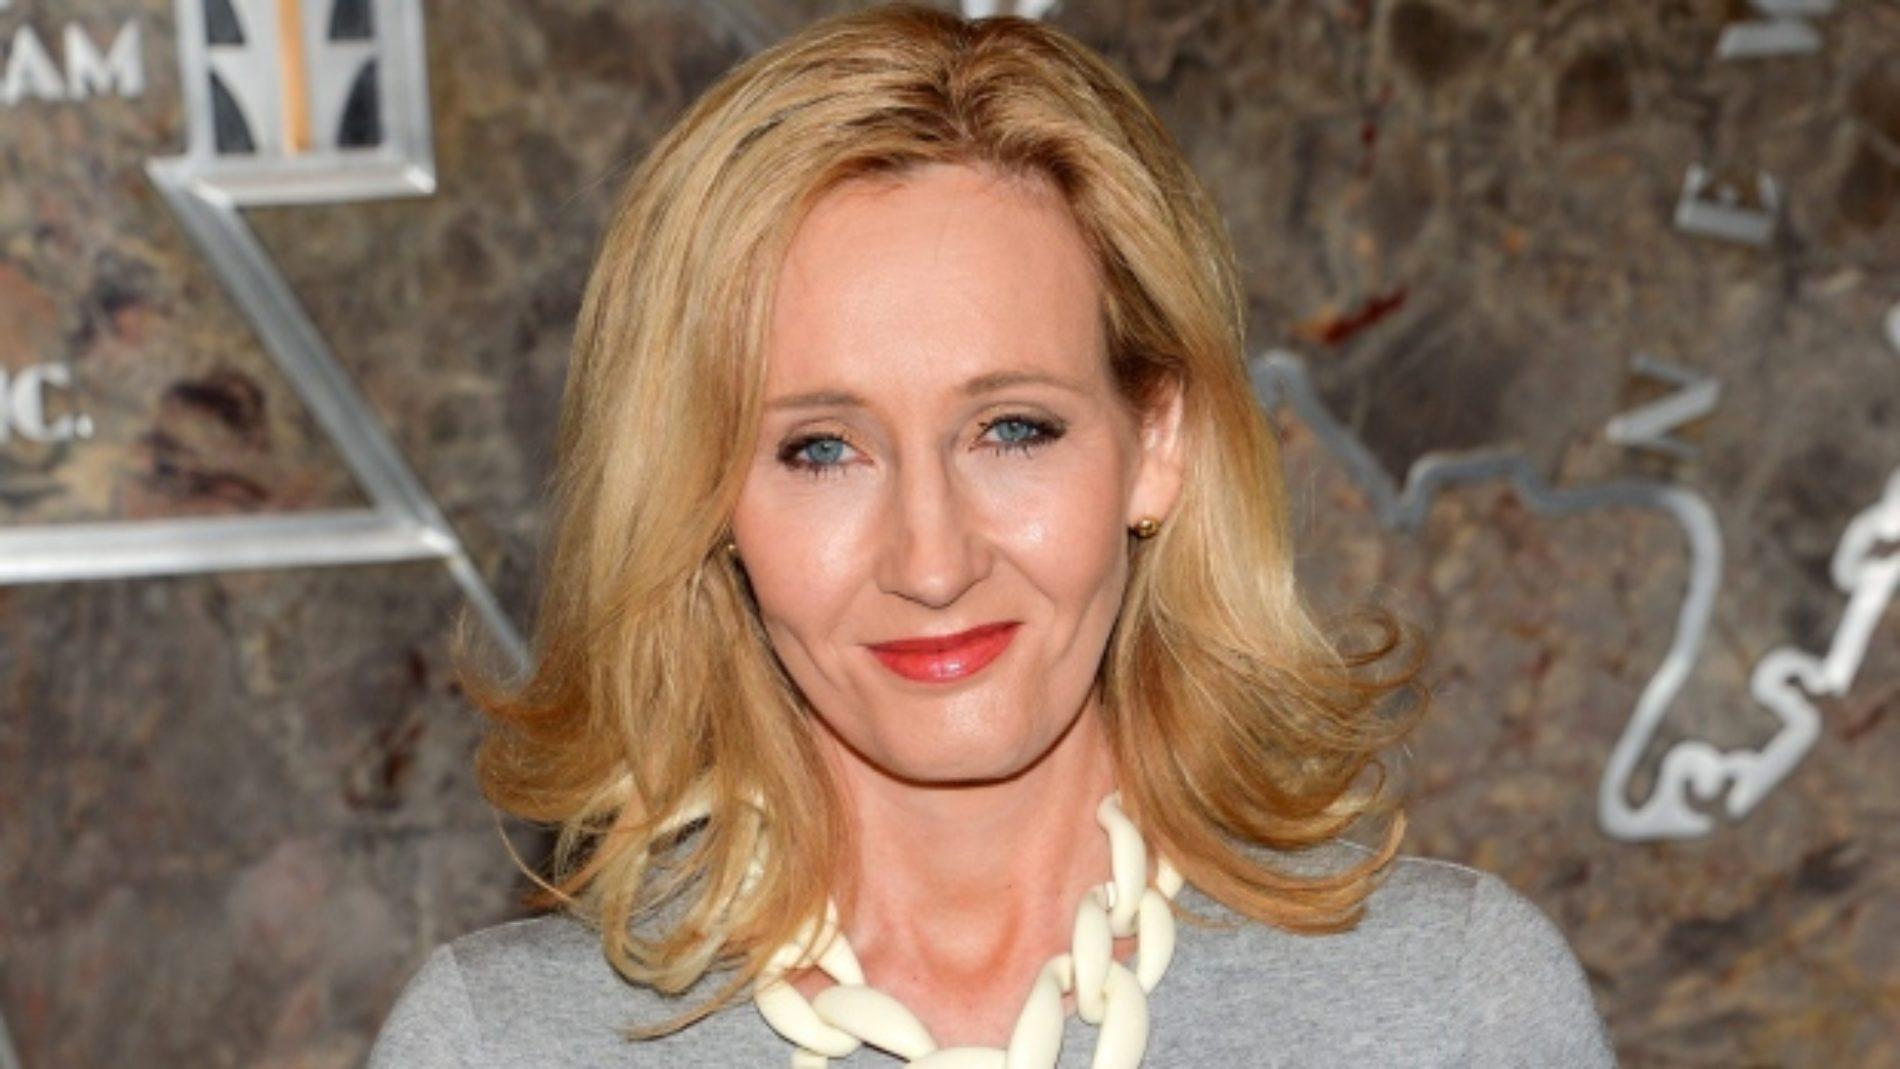 JK Rowling hints Dumbledore's gay life will be explored in Fantastic Beasts films